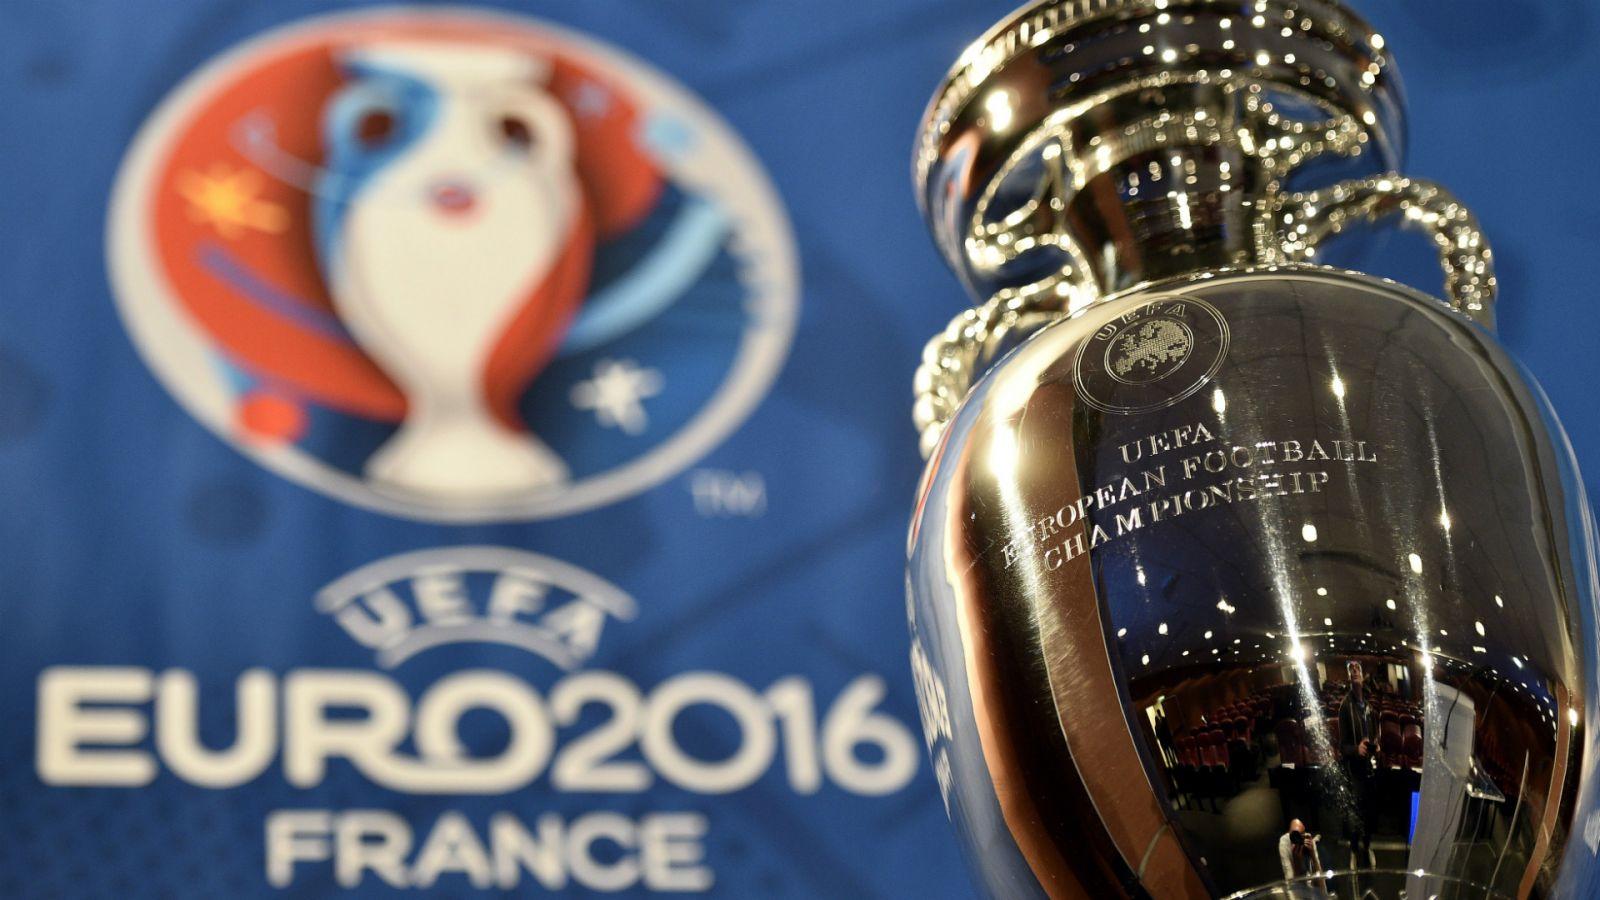 евро 2016 по футболу